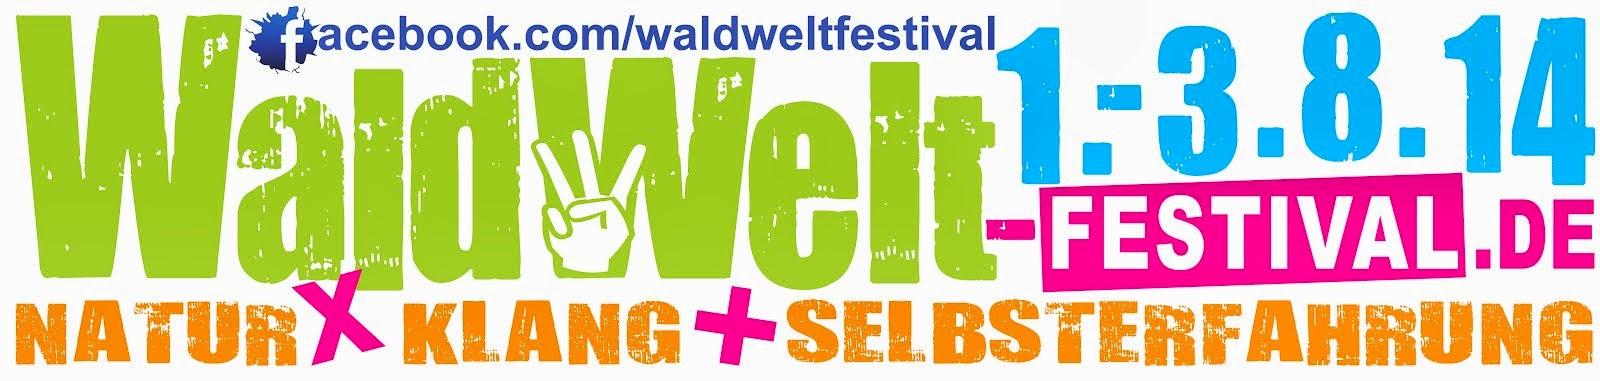 Offizielles Banner WaldWelt-Festival 2014